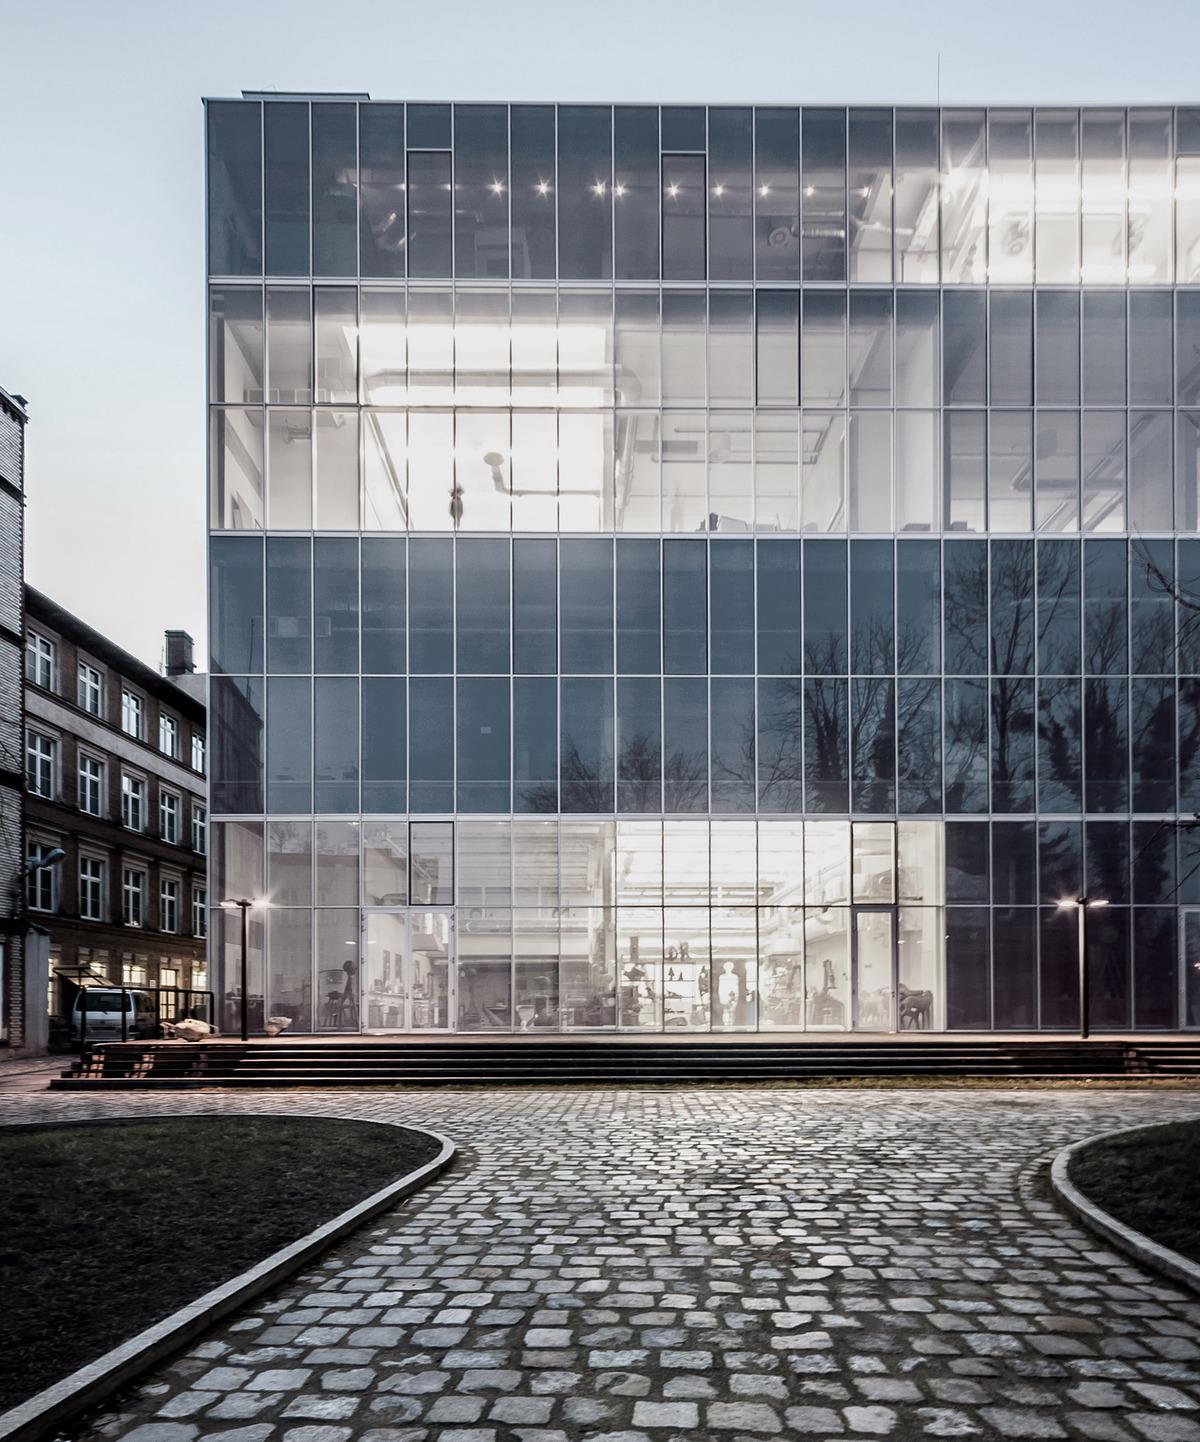 East facade night_Photo by Maciej Lulko